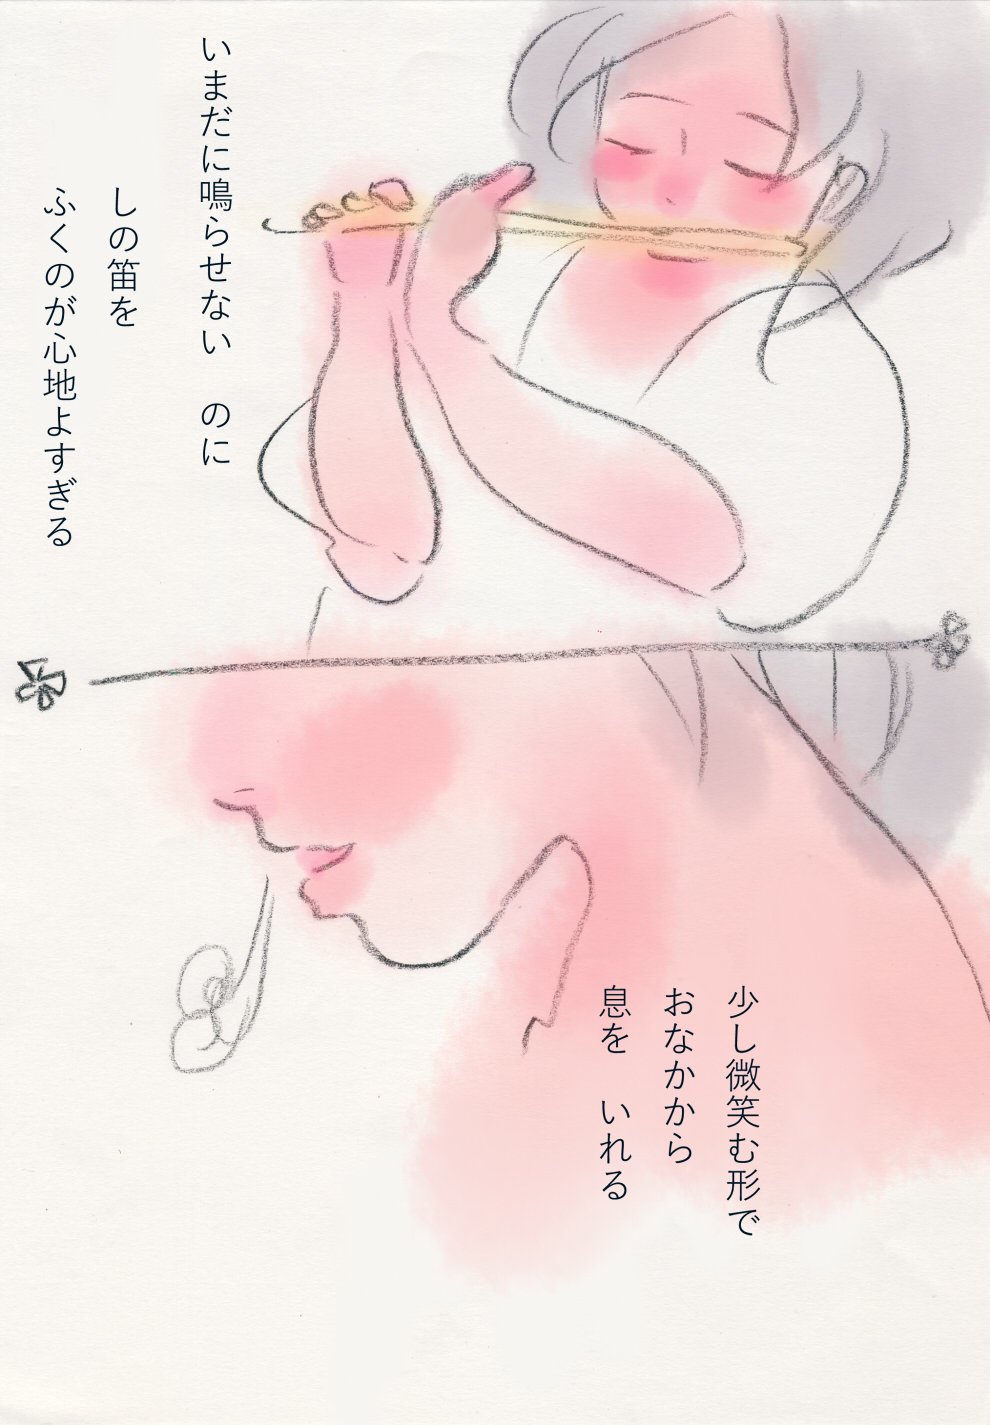 http://ahito.com/comic/ehon/kamiuta/img/20170808/01.jpg